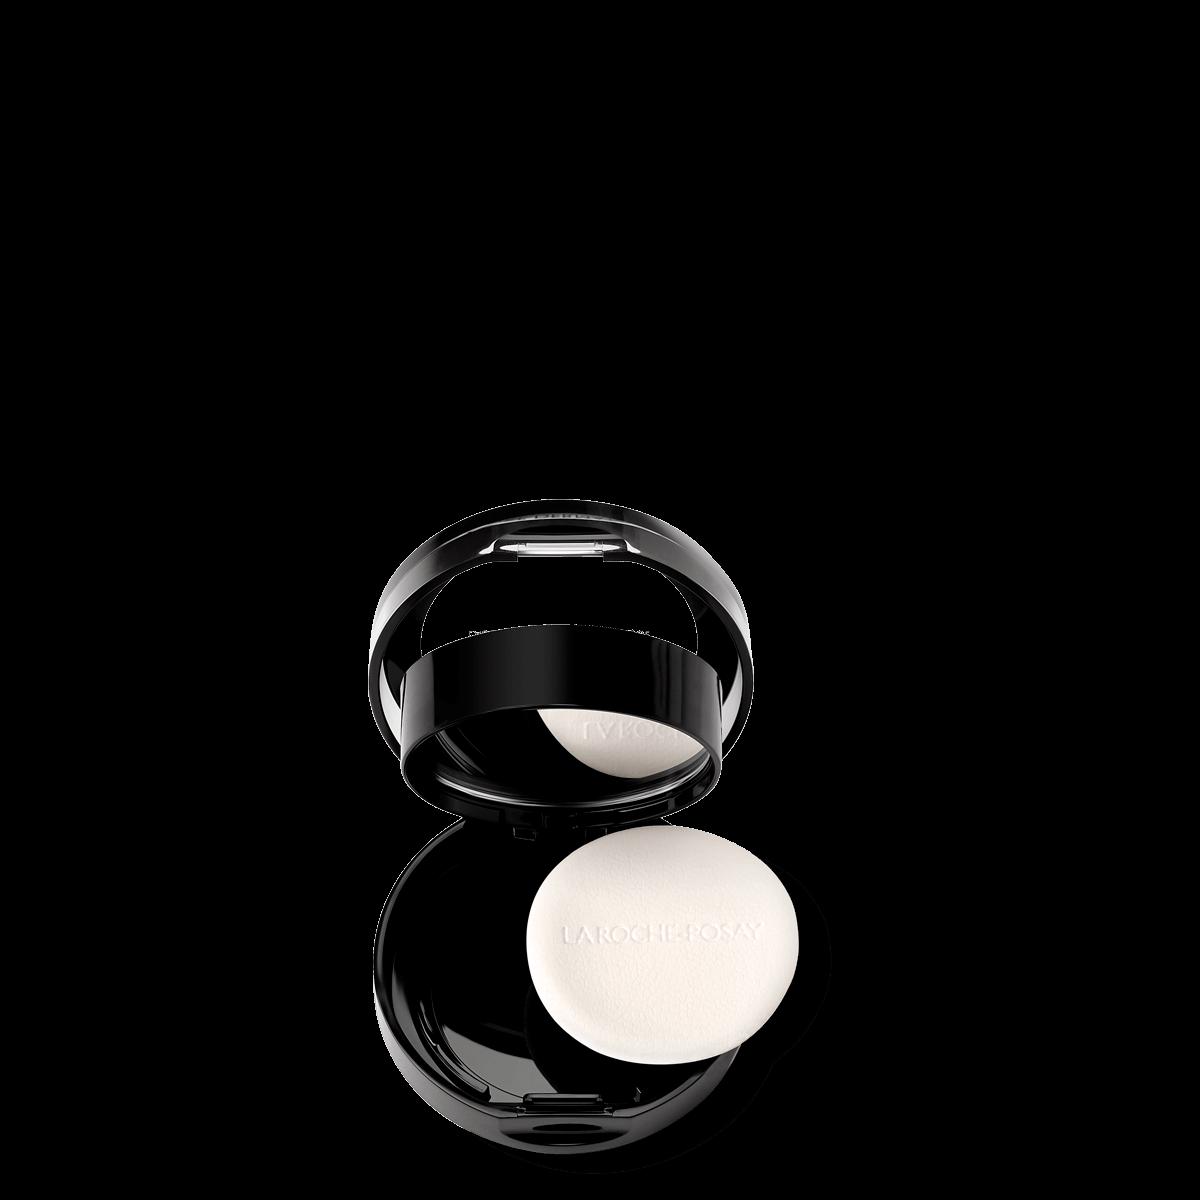 La Roche Posay Sensitiv Toleriane Sminke BLUSH GoldenPink 30102415 O